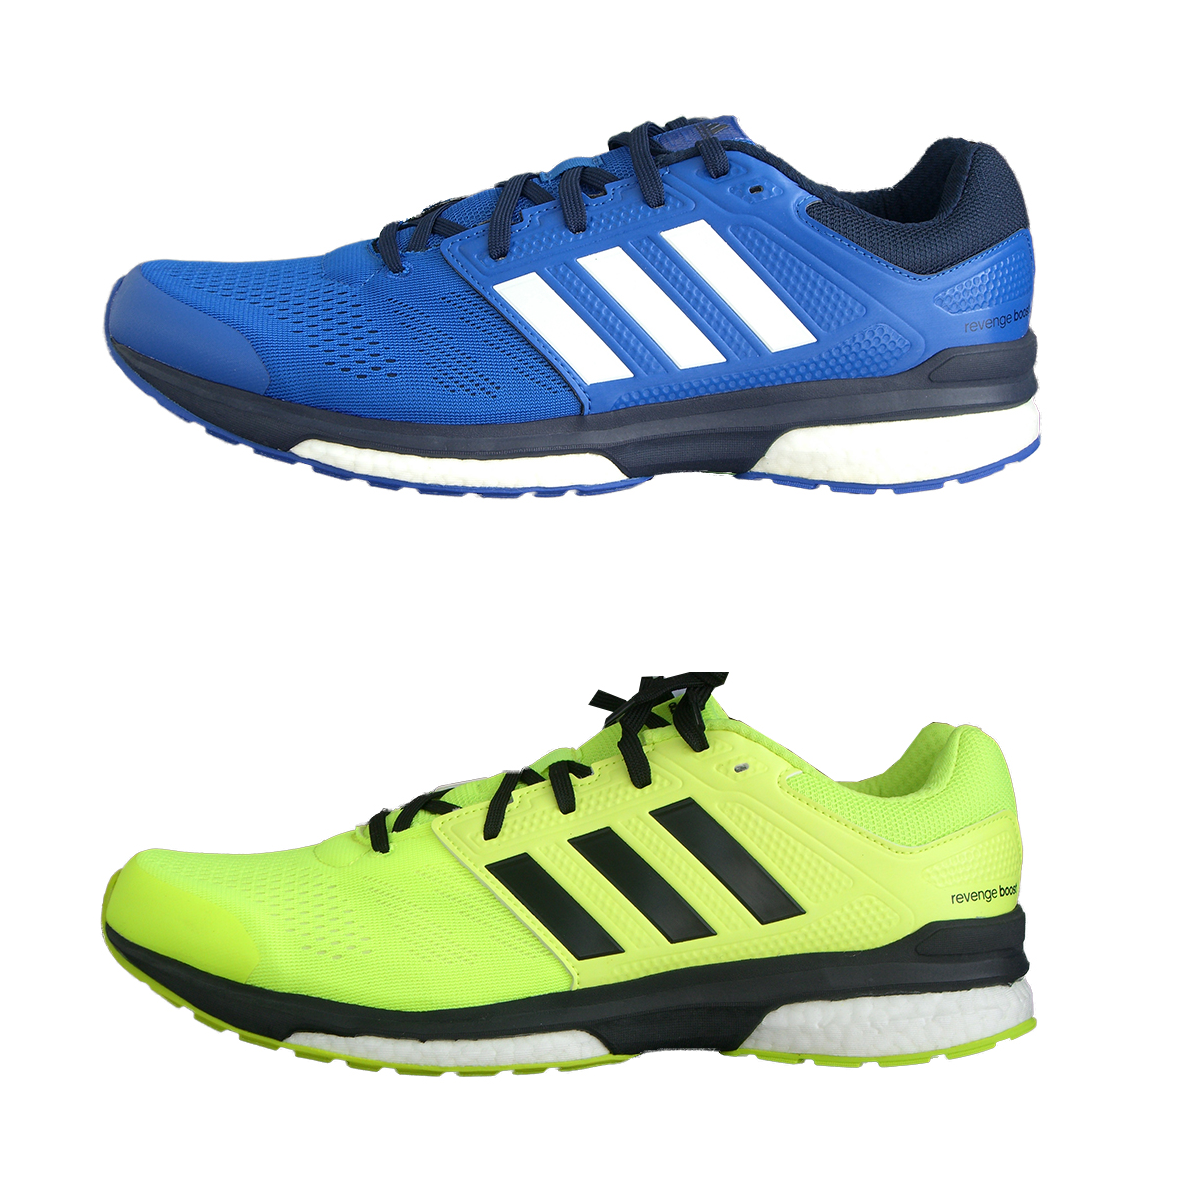 b712142dcbc7e0 Adidas Revenge Boost 2 M Herren Laufschuhe Schuhe